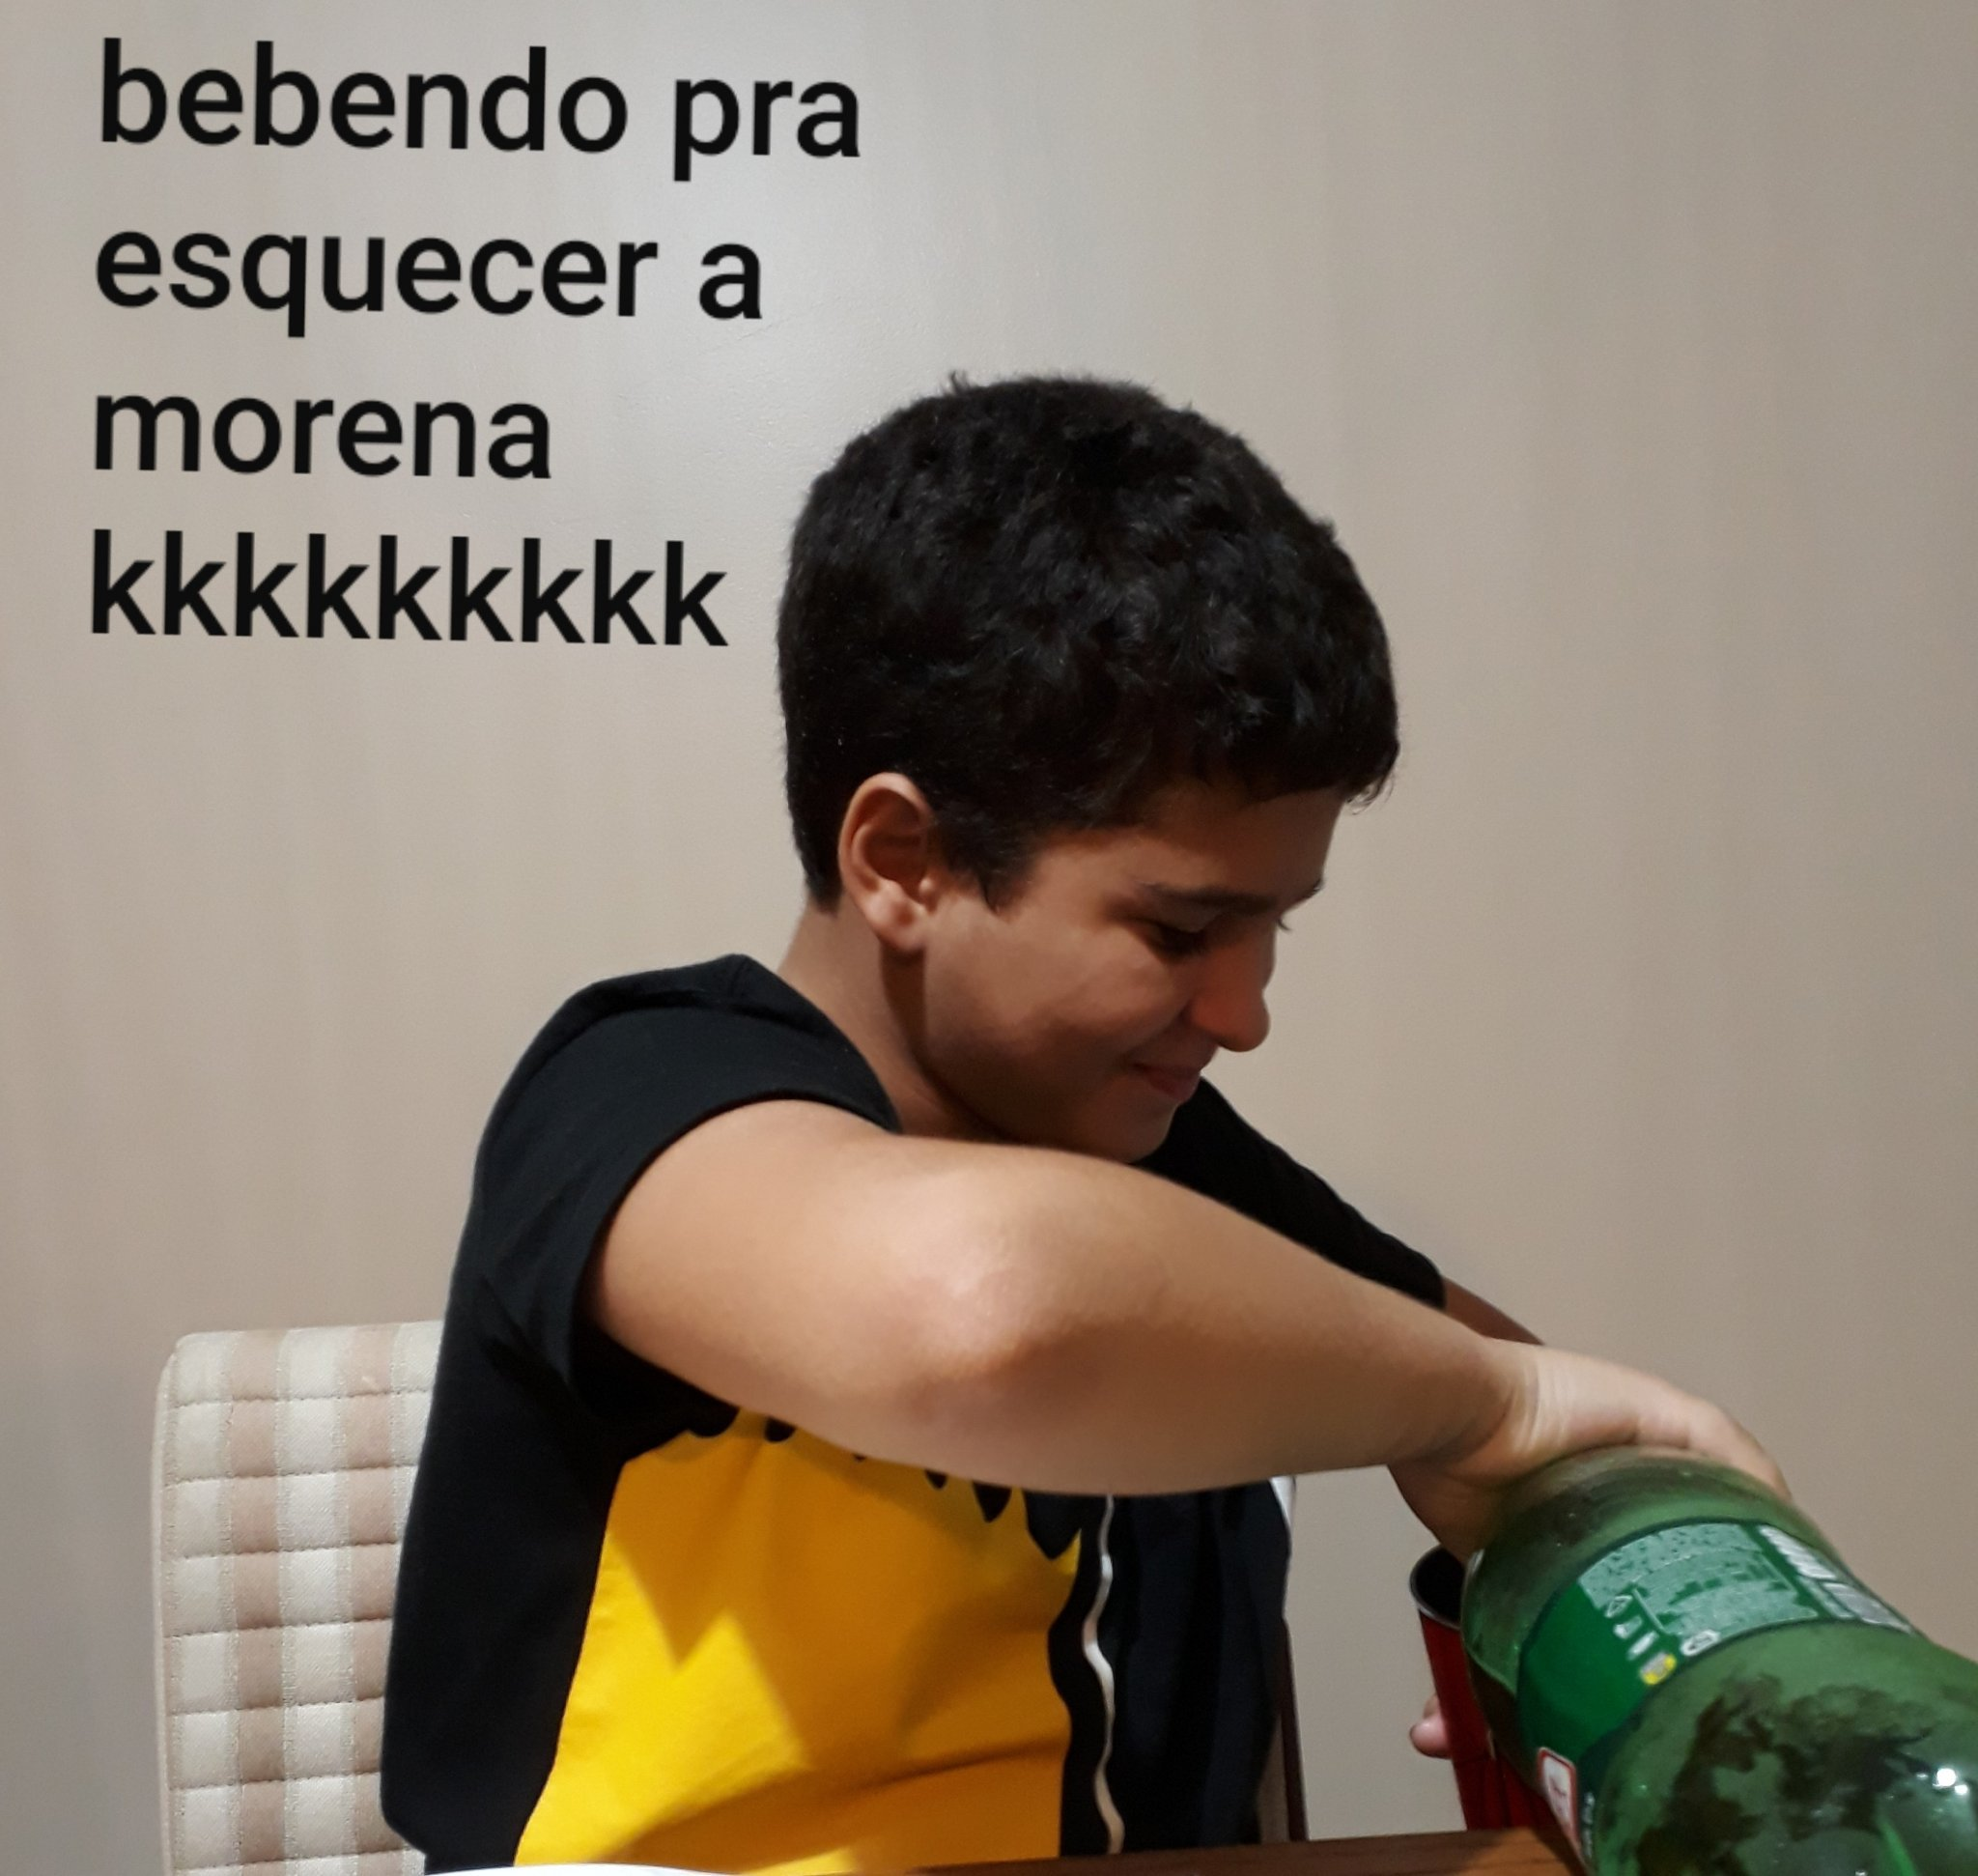 Morena - meme